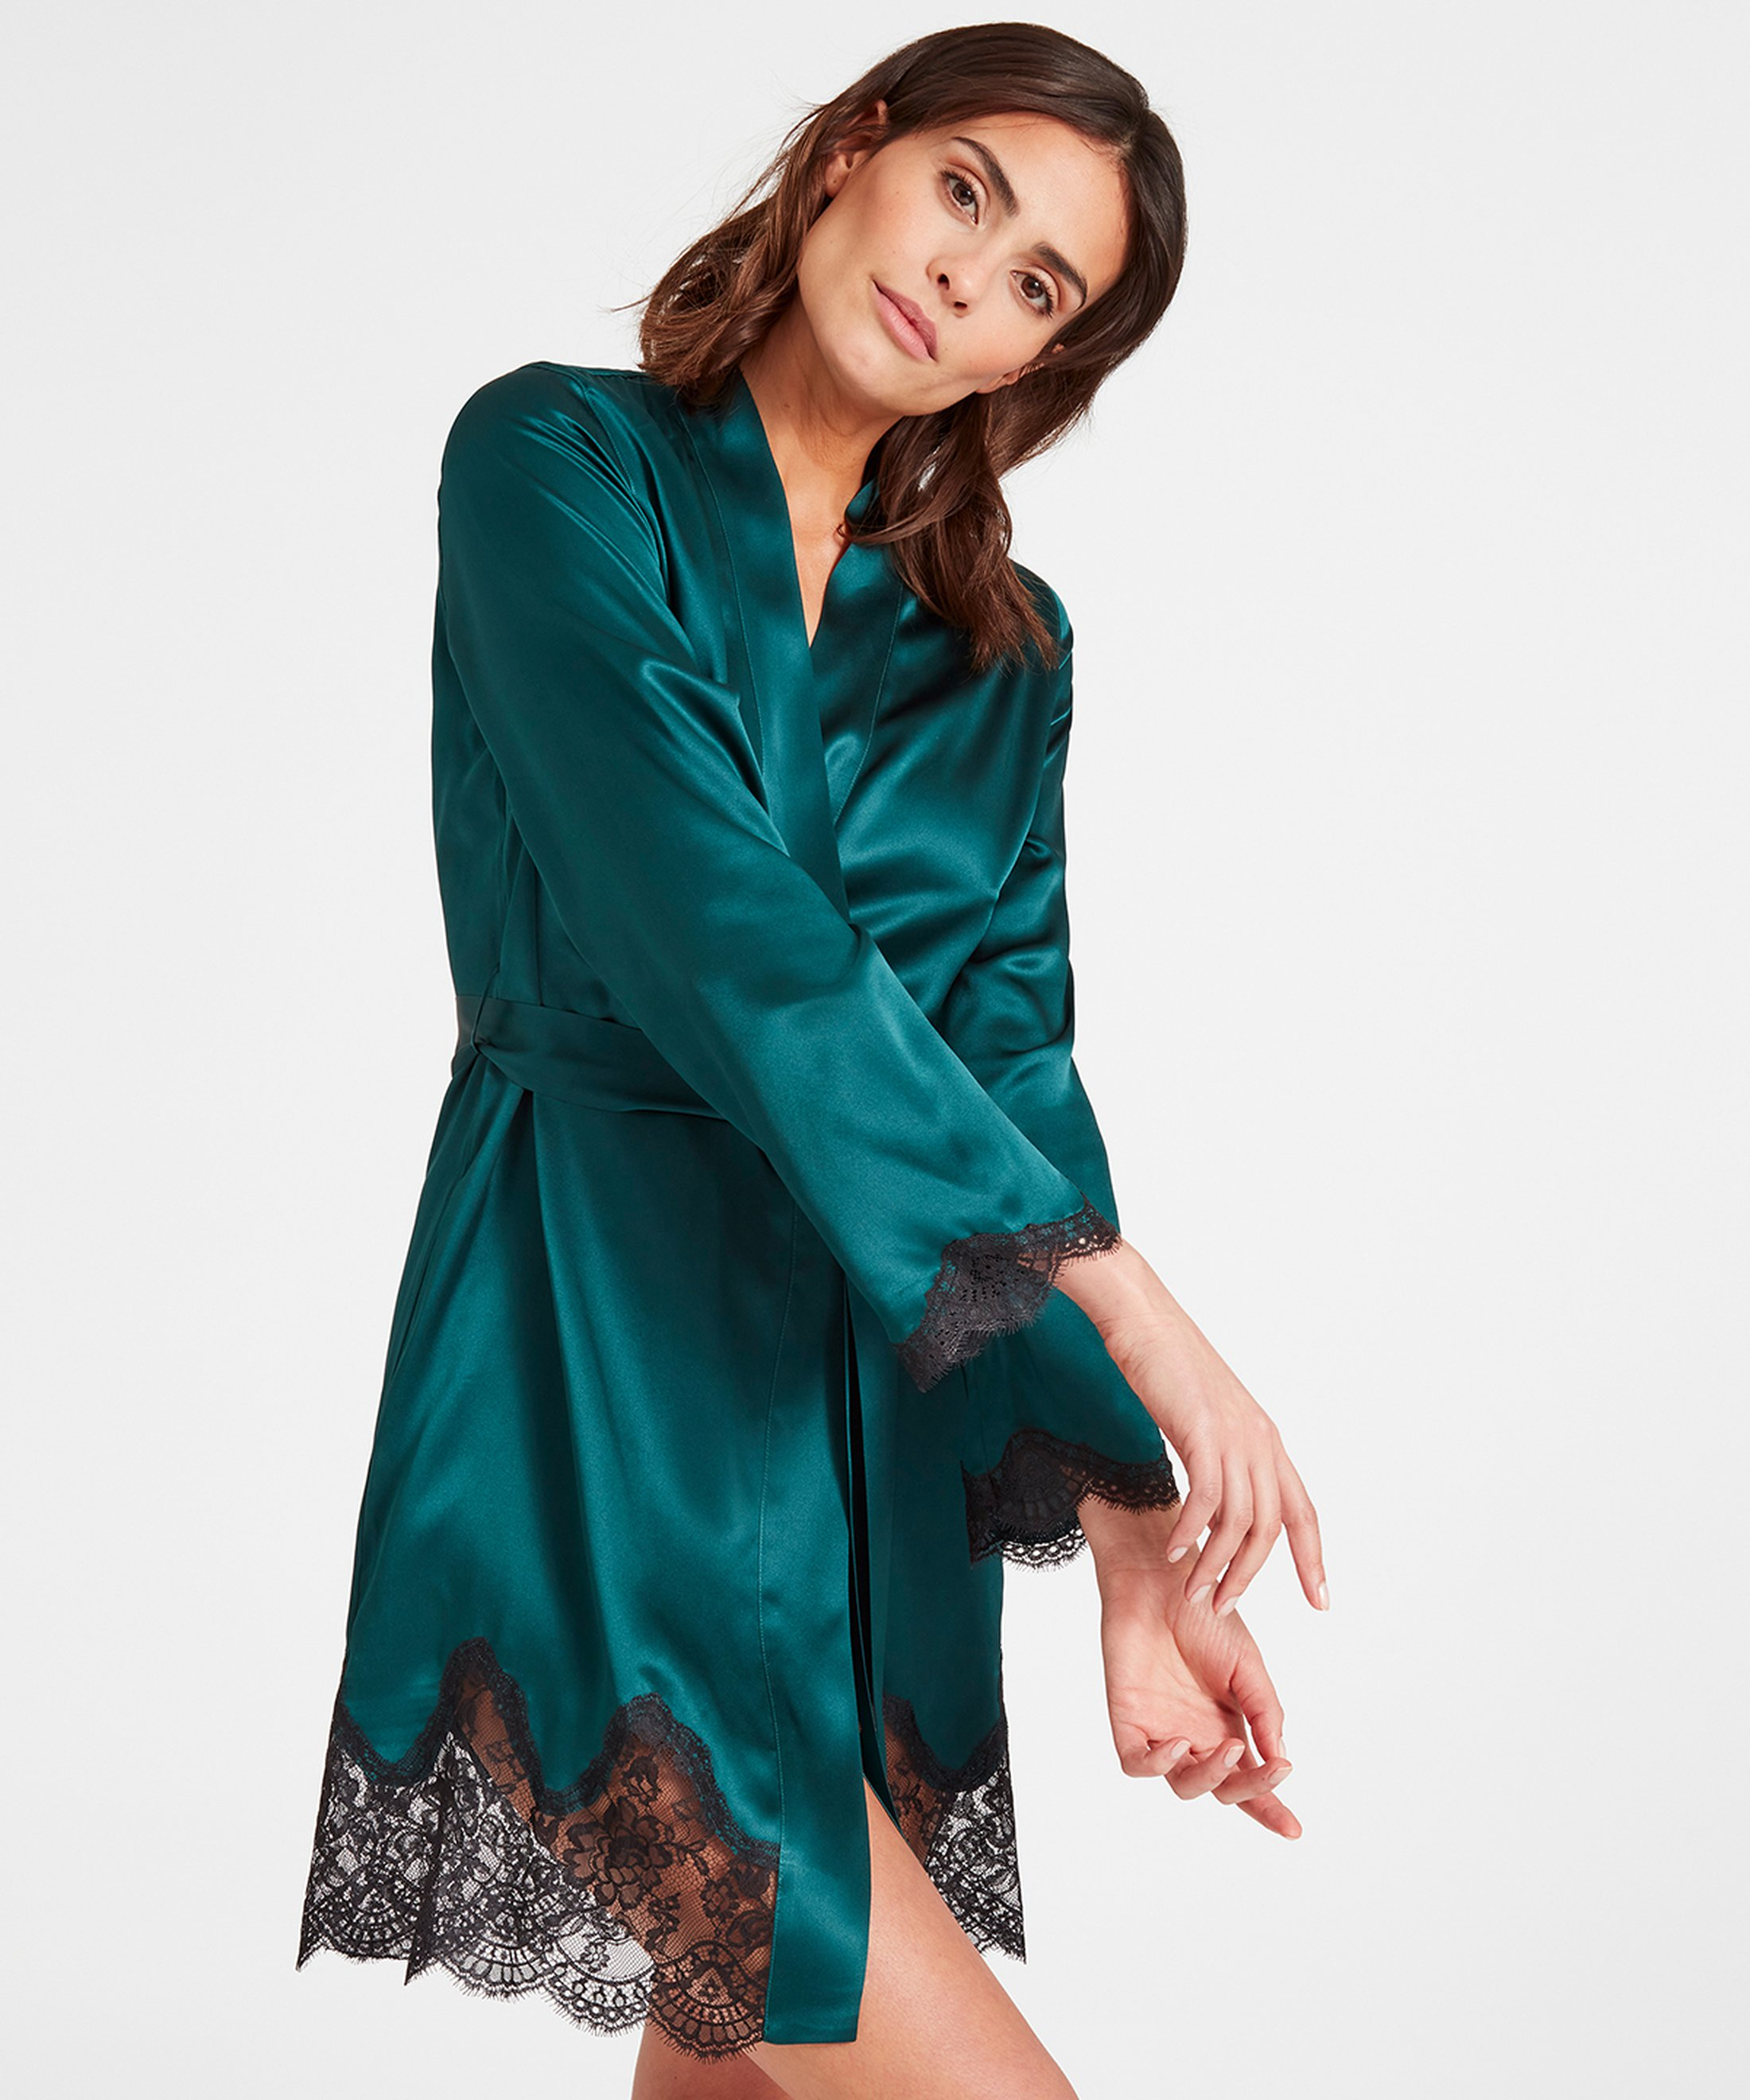 TOI MON AMOUR Kimono en soie Emeraude | Aubade